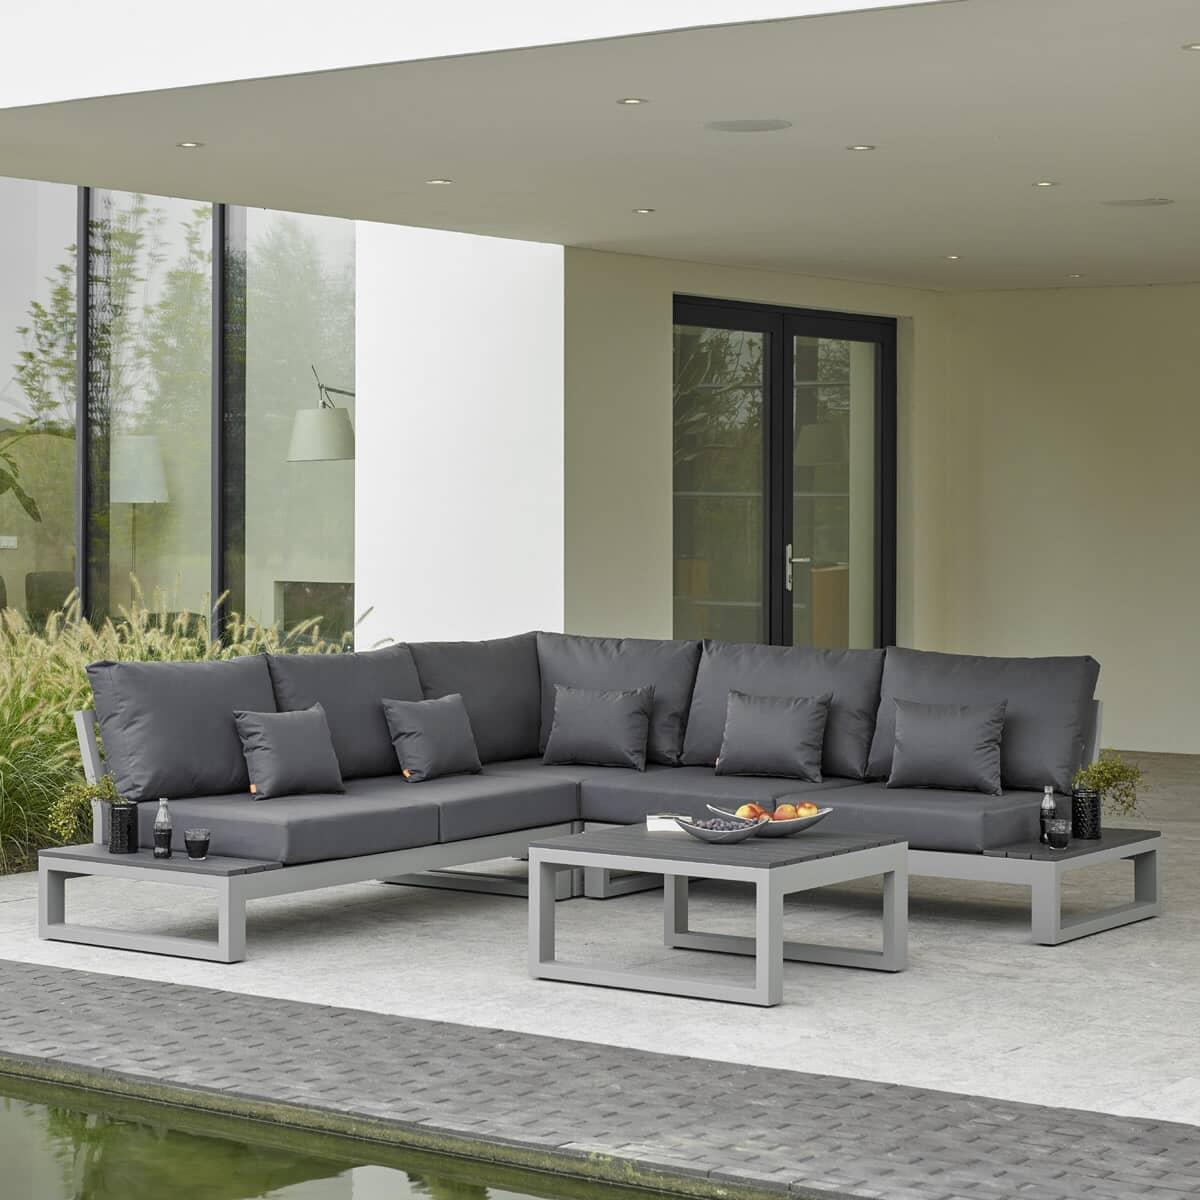 Life Mallorca Open Corner Set Matt Grey Aluminium With Soft Touch Carbon Cushions Limallorcor2020 Garden Furniture World